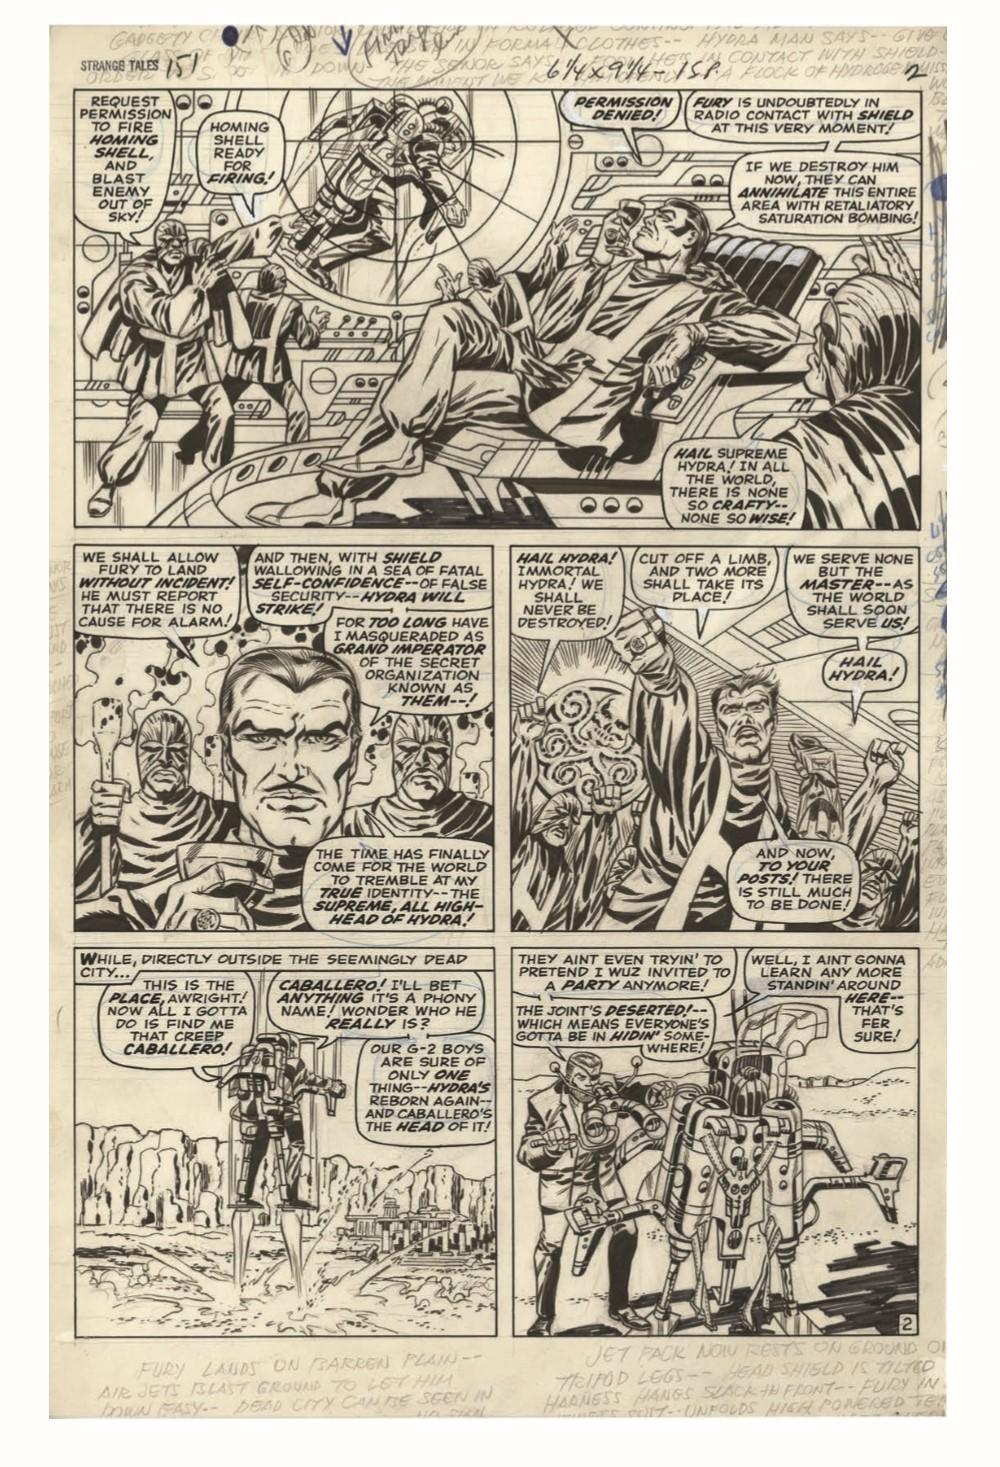 STERANKO_artisan_edition_pr-5 ComicList Previews: JIM STERANKO'S NICK FURY AGENT OF S.H.I.E.L.D. ARTISAN EDITION TP